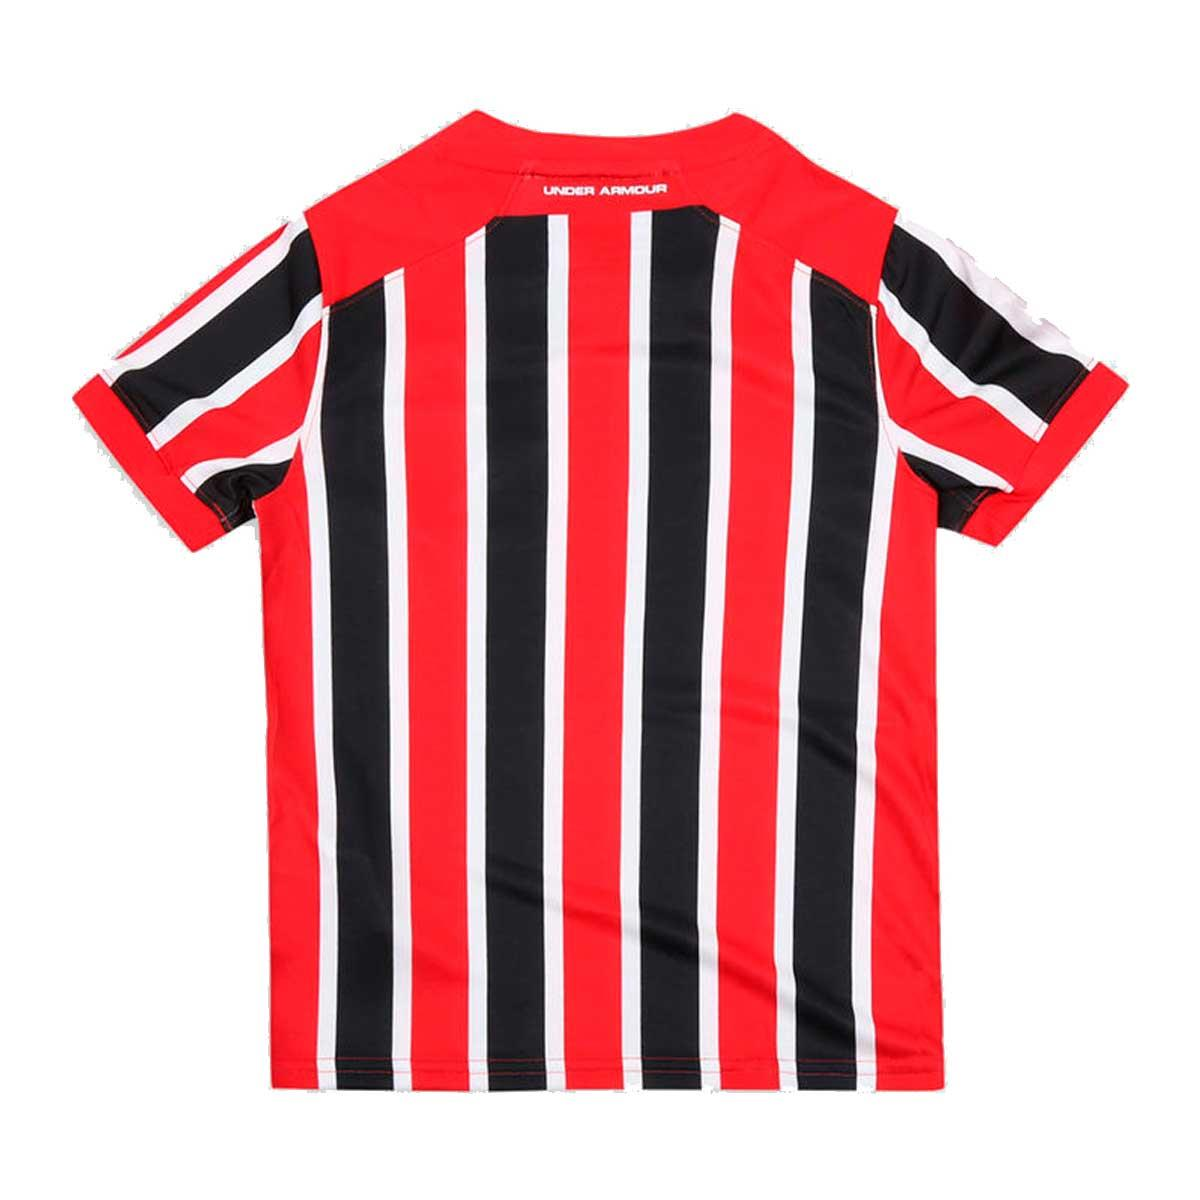 2d524d30a5d Camisa Under Armour São Paulo Torcedor Infantil 2017 2018